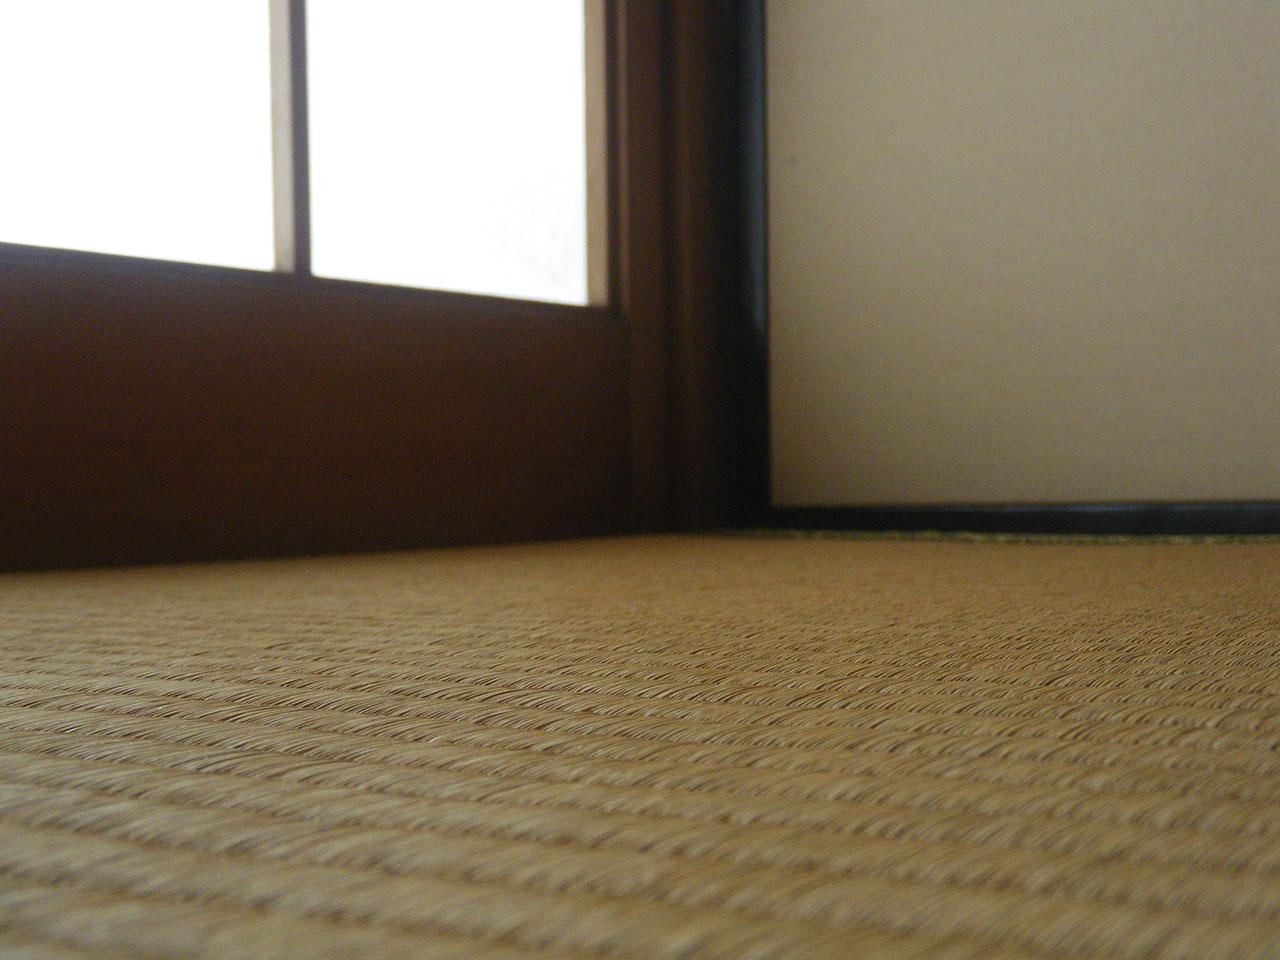 pentax w60で撮影した畳